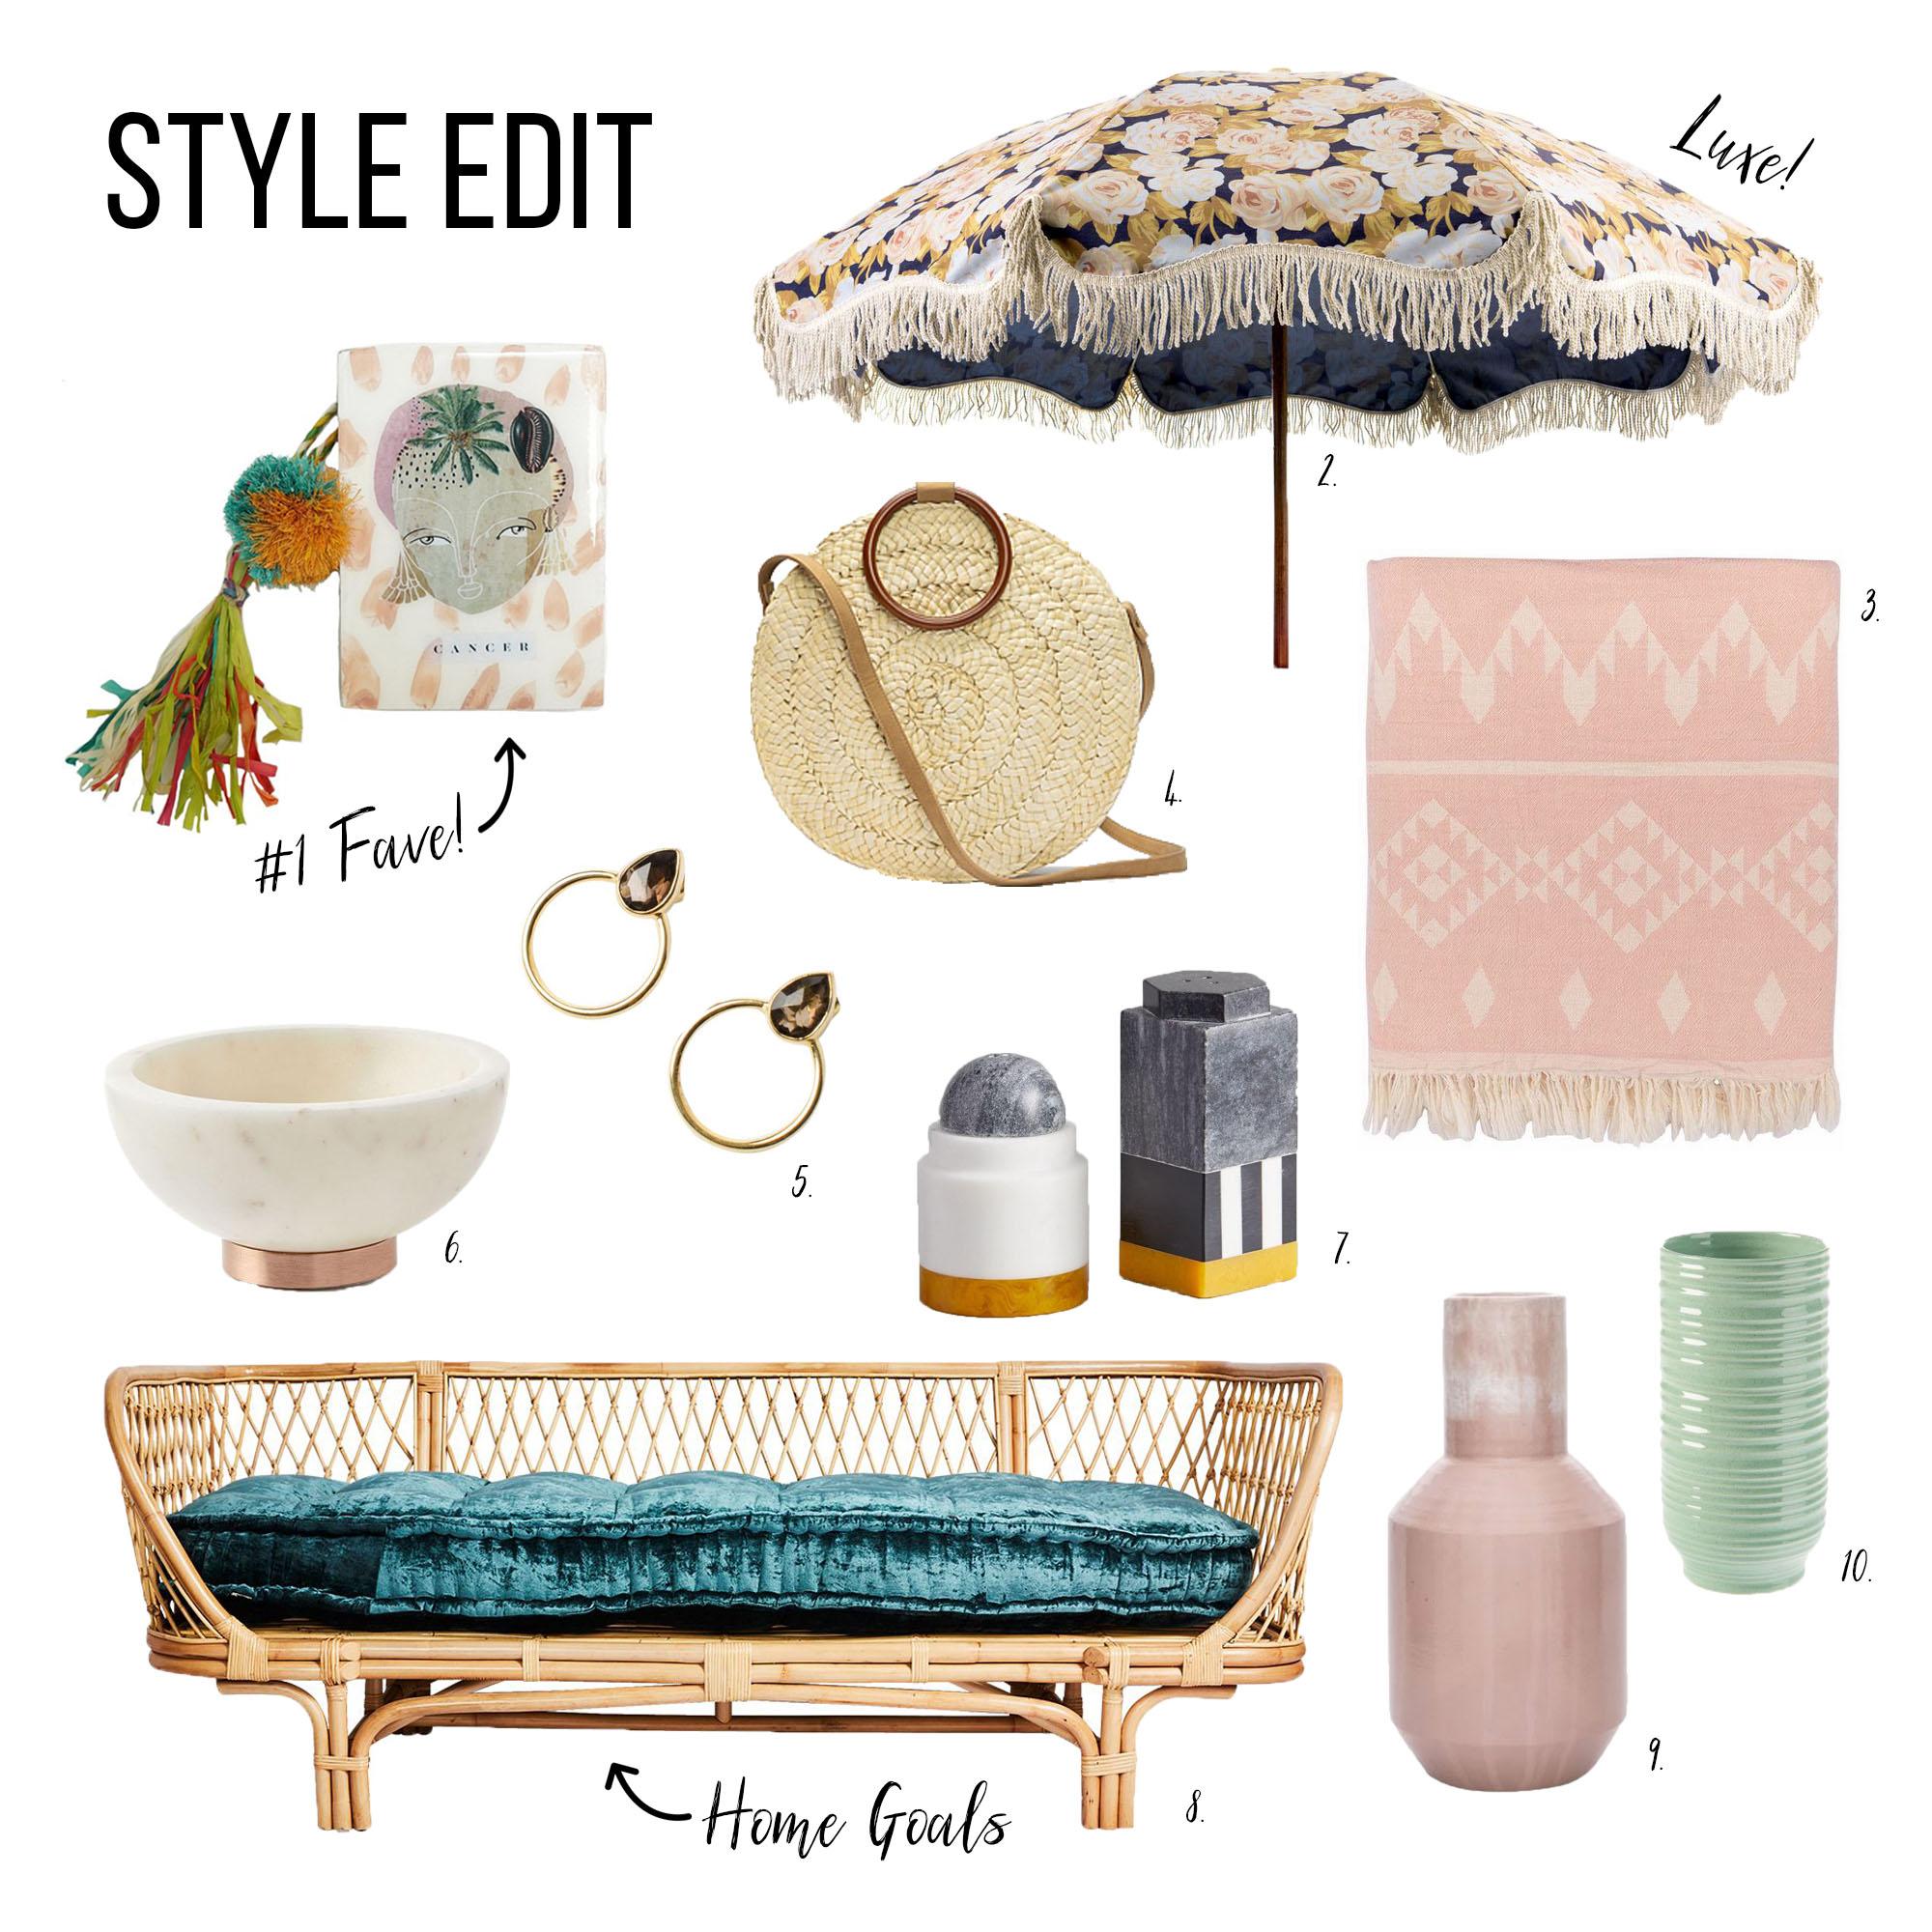 Style Edit 2_Jessica Flood Design.jpg